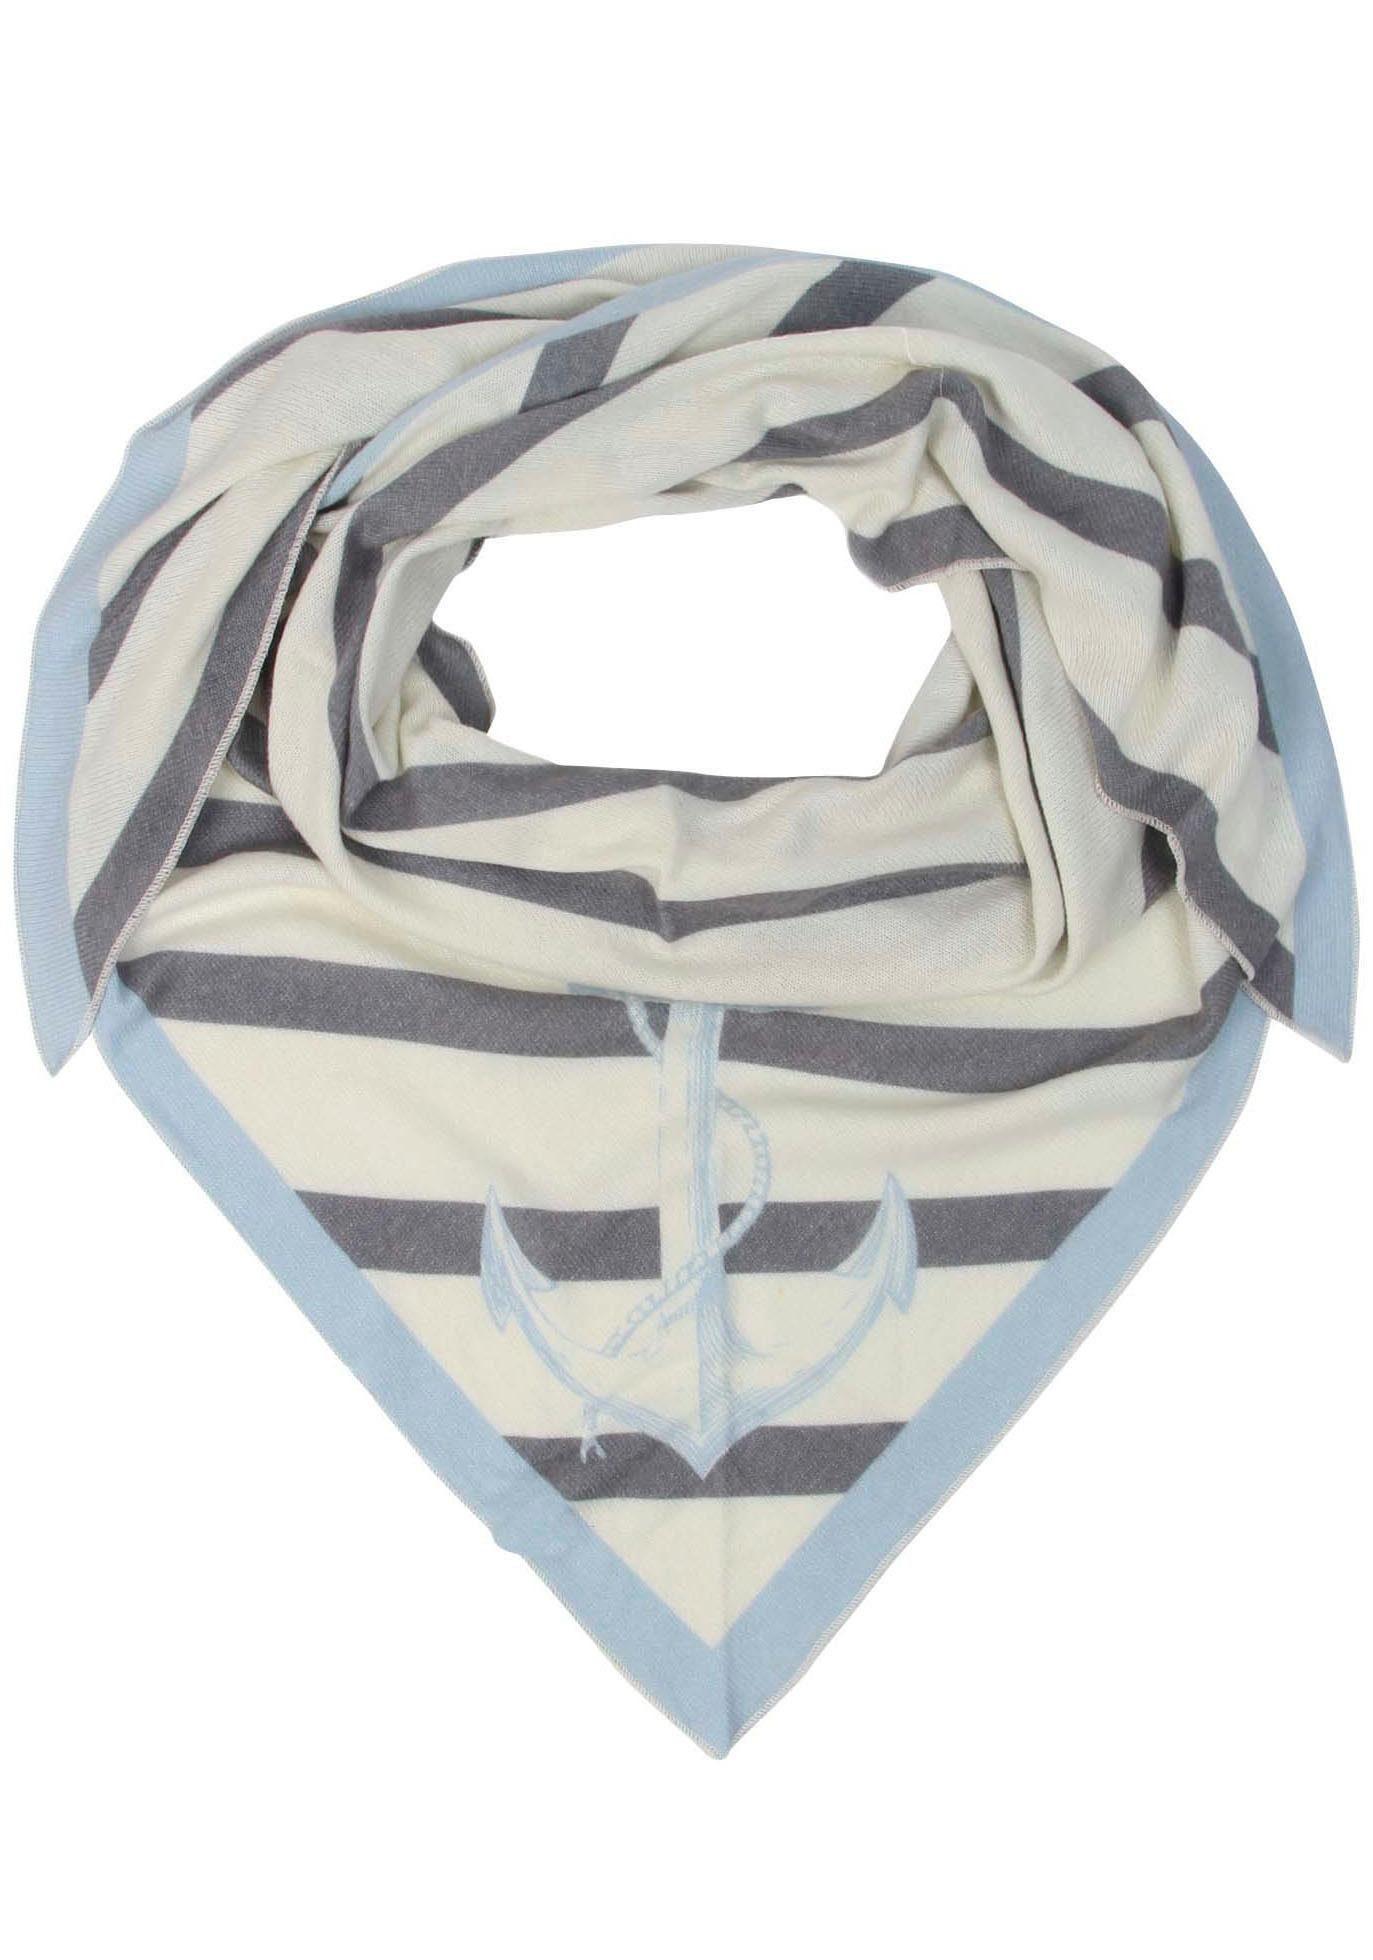 Zwillingsherz Dreieckstuch Tuch Esta mit Kashmir Anteil, gestreift, Anker, Feinstrick